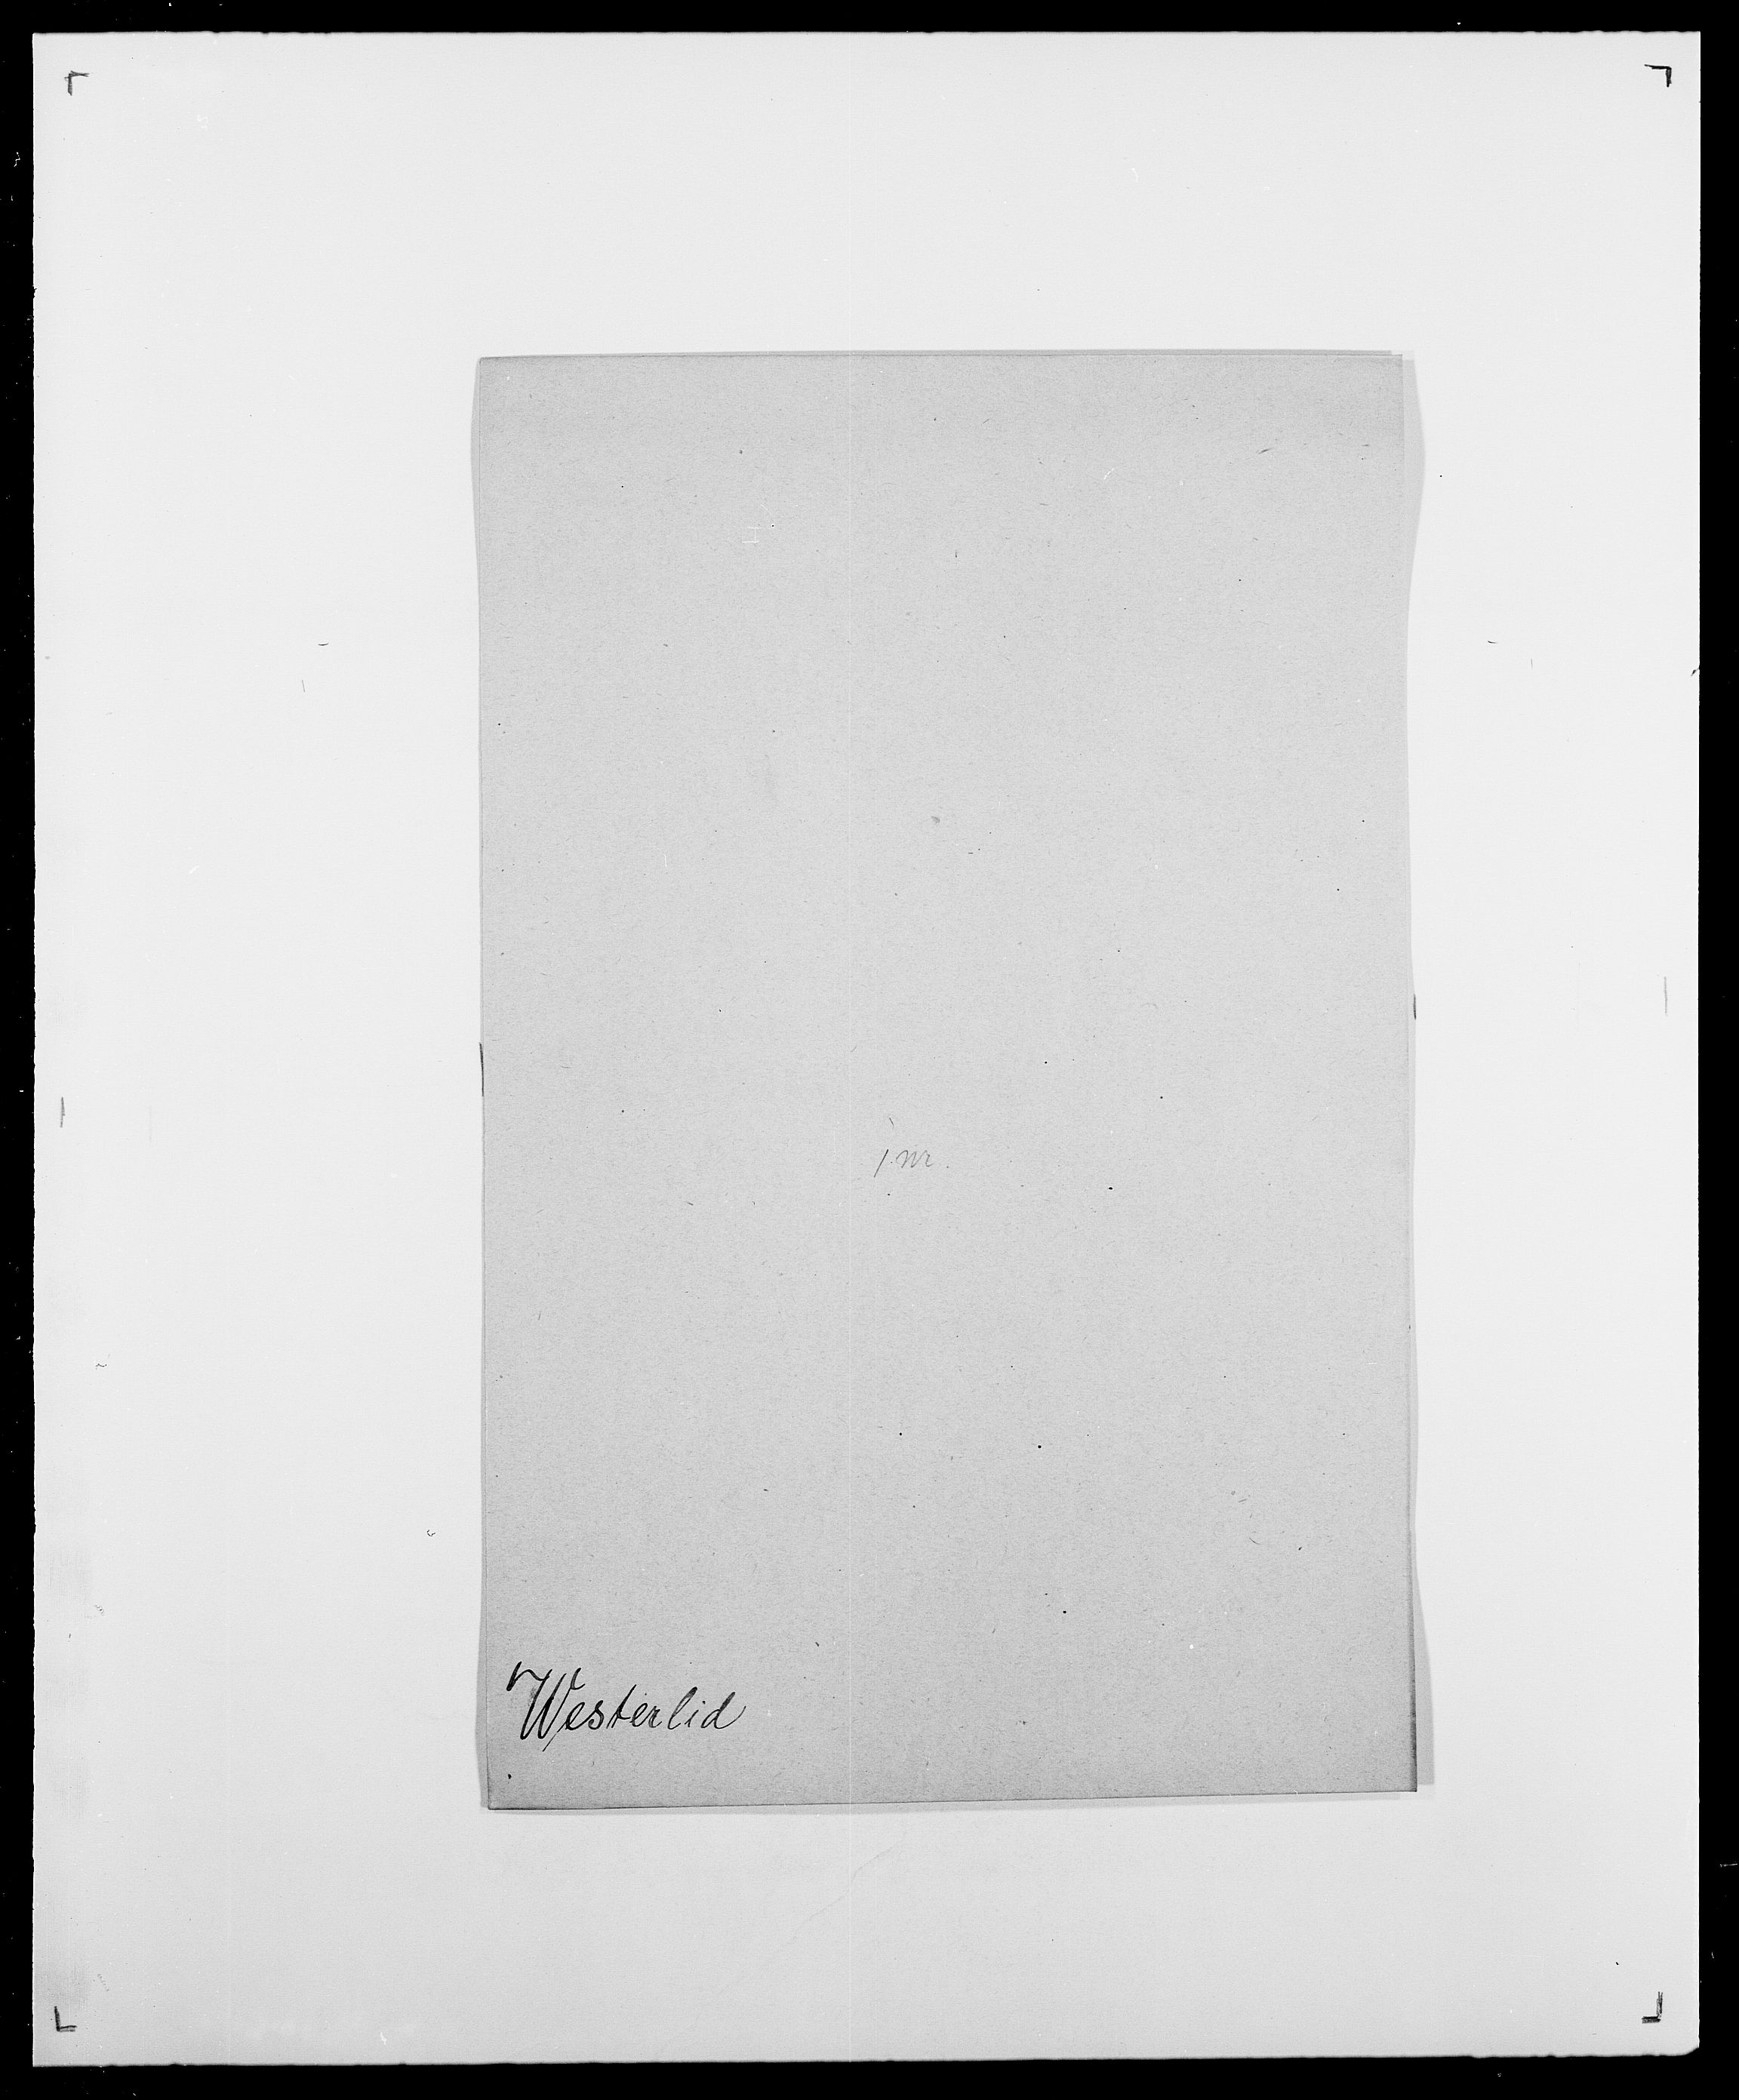 SAO, Delgobe, Charles Antoine - samling, D/Da/L0041: Vemmestad - Viker, s. 283